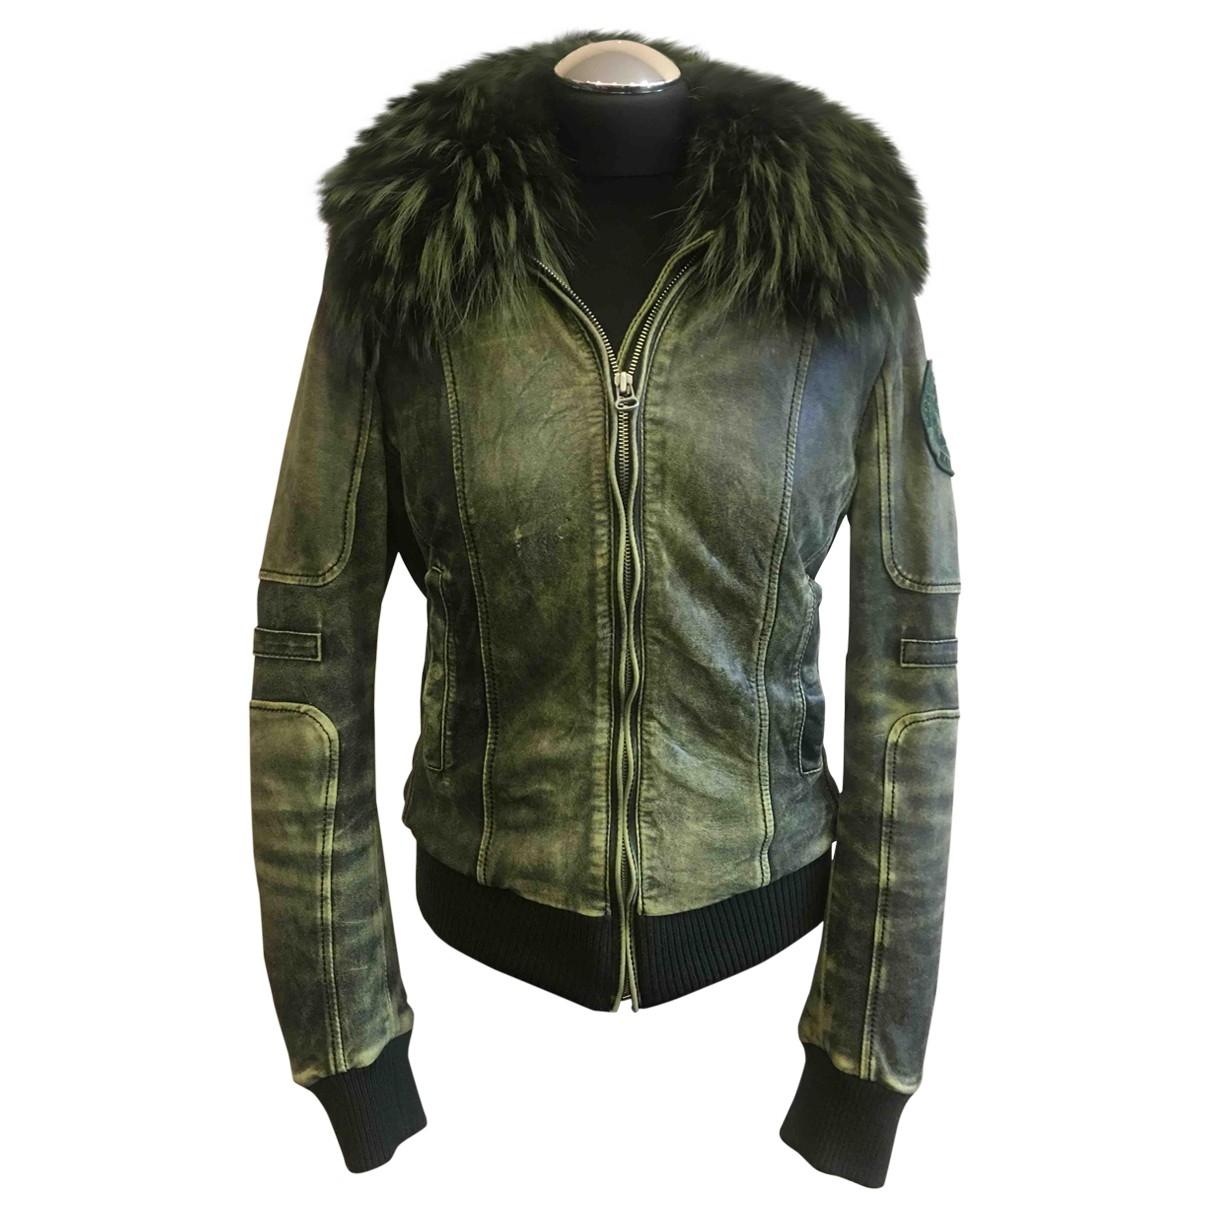 Napapijri \N Green Leather jacket for Women M International